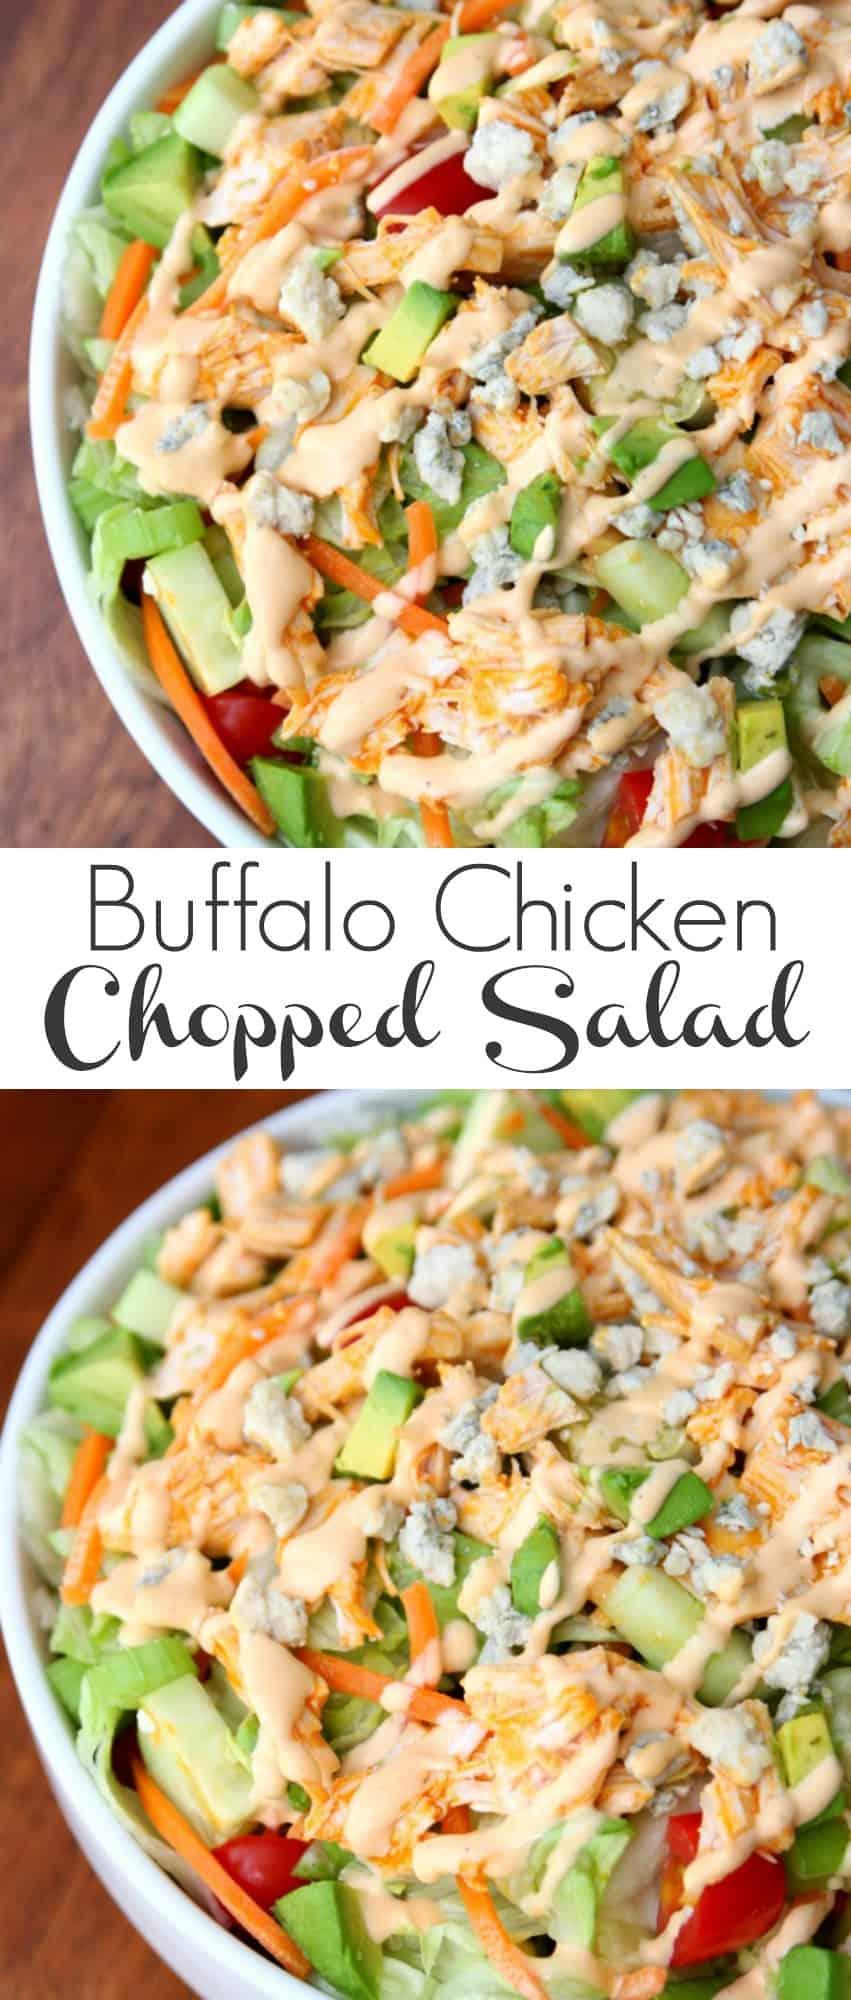 ... www.happygoluckyblog.com/2016/06/buffalo-chicken-chopped-salad.html